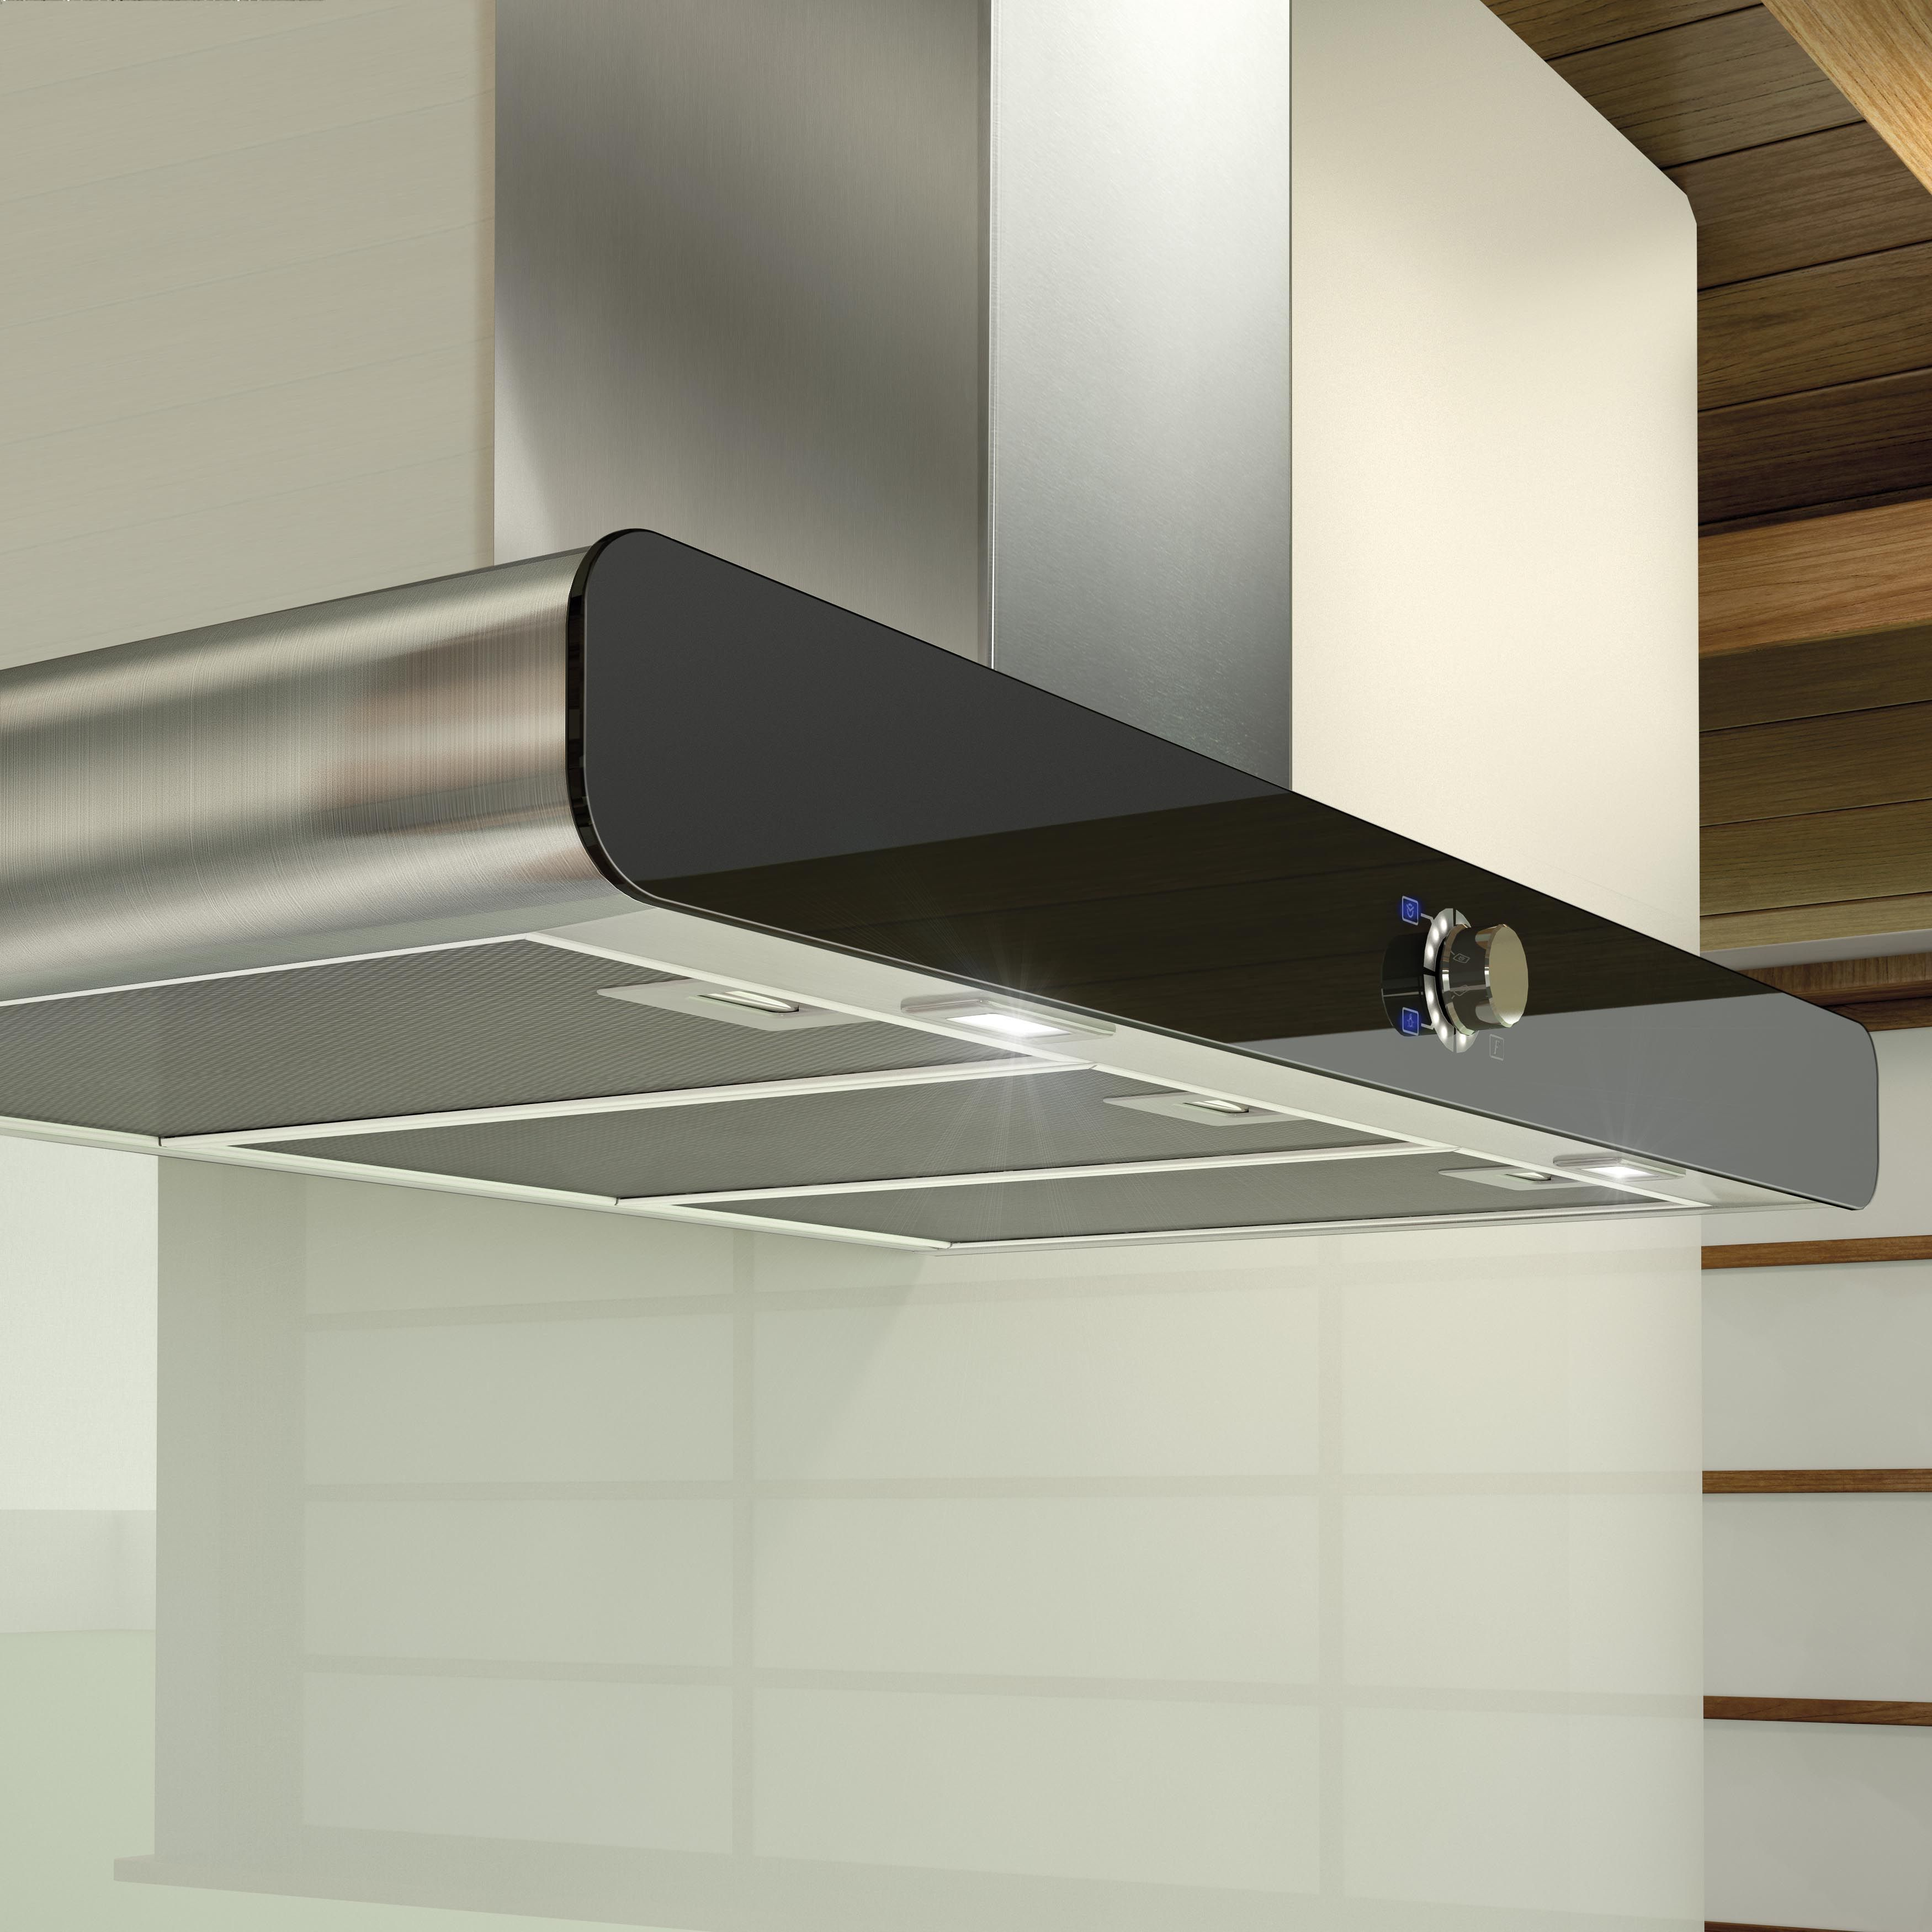 f122 slim particolare house airforce cooker hoods hauben hotte kitchen home appliances. Black Bedroom Furniture Sets. Home Design Ideas